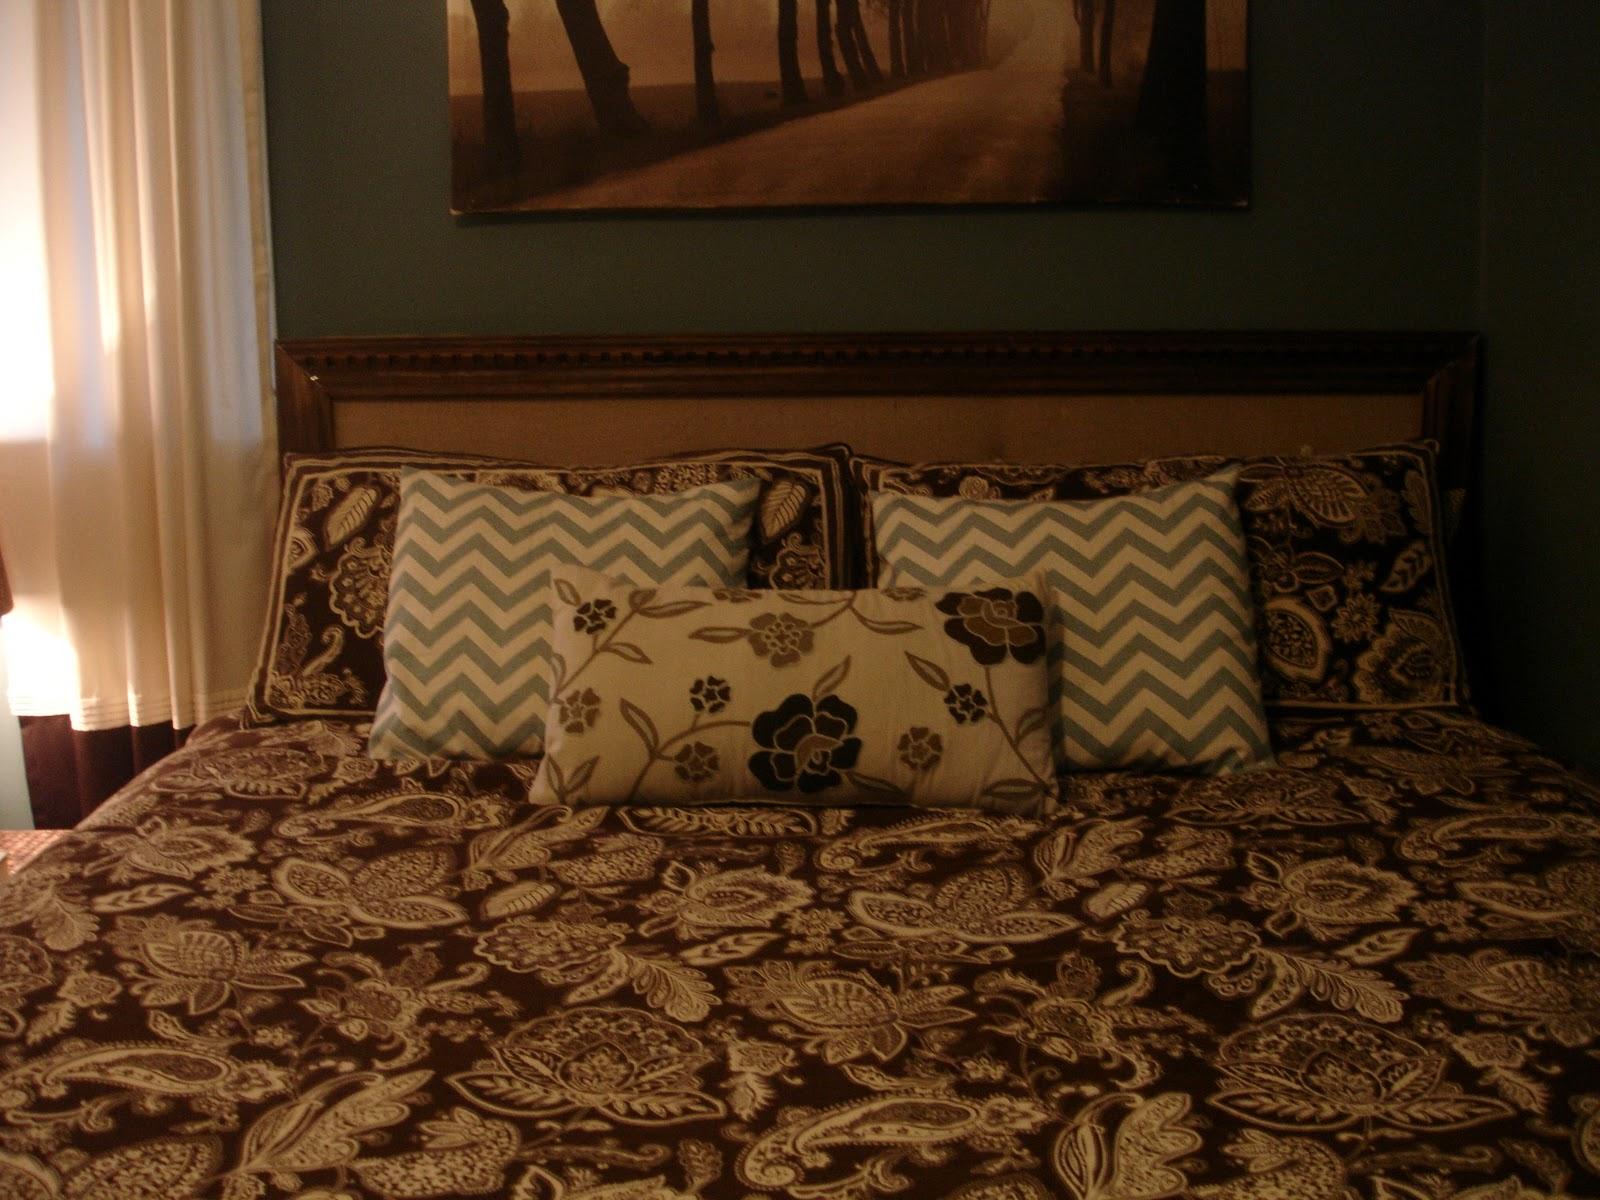 surripui design net diy headboard bed burlap queen inspiring pics ideas